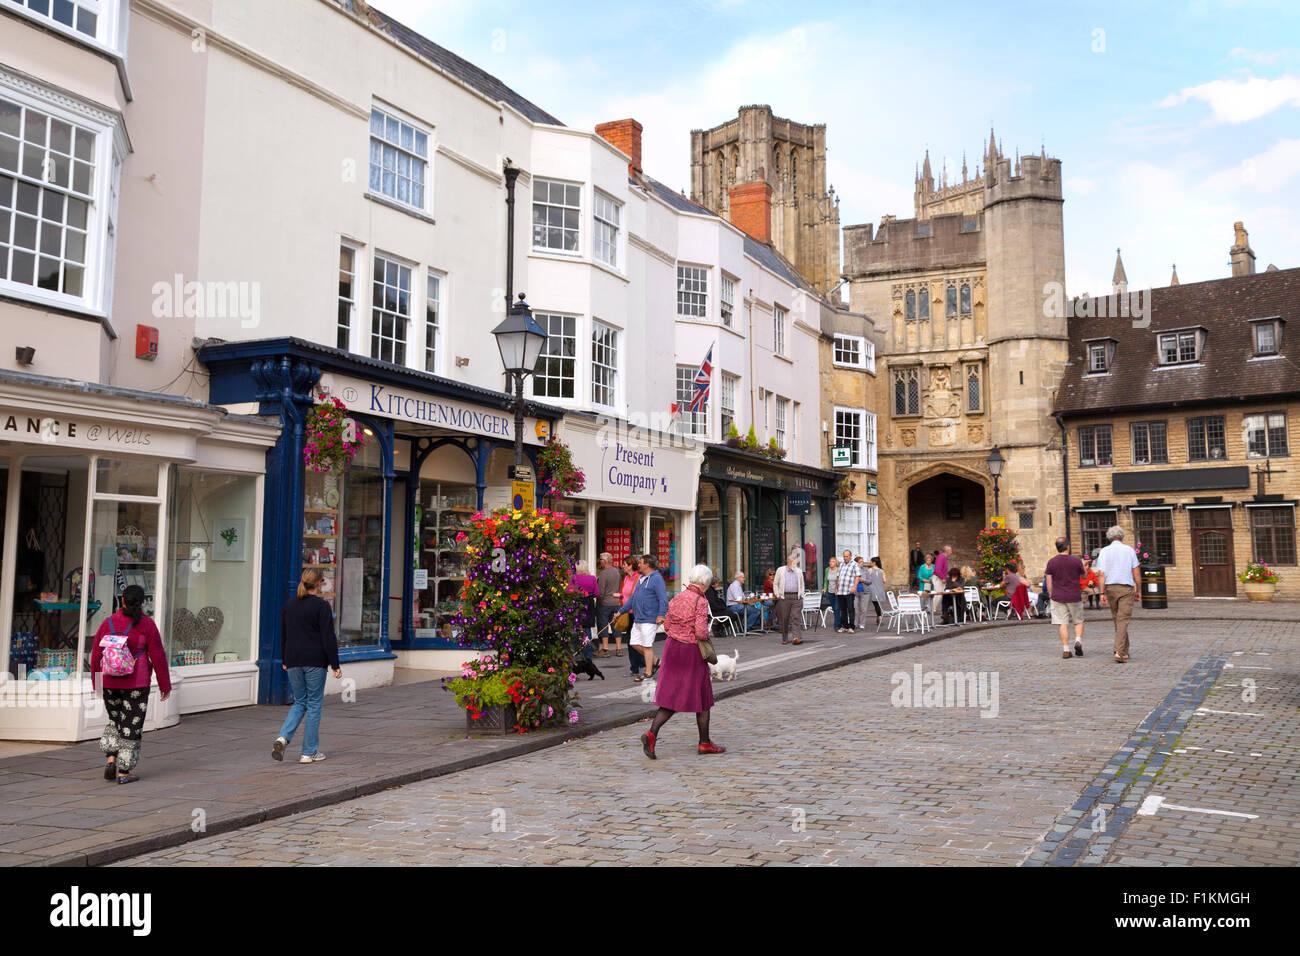 Street scene in the Marketplace, Wells city centre, Wells, Somerset England UK - Stock Image